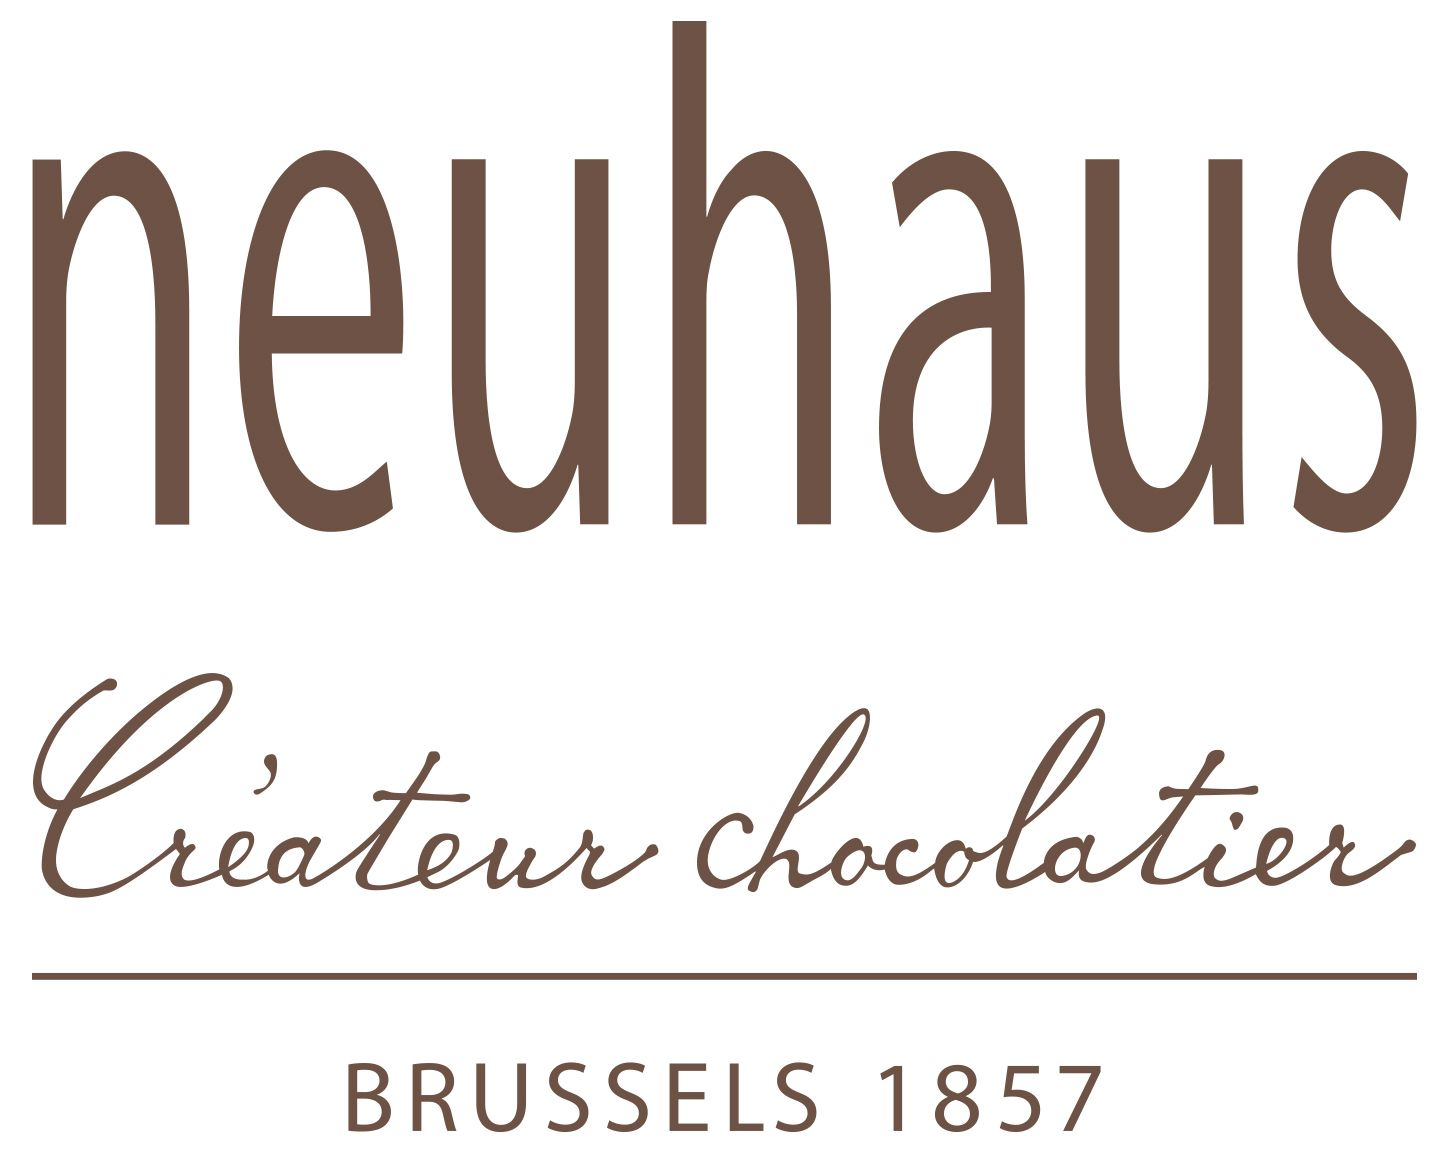 chocolatier logo | Zurück zu Neuhaus Créateur Chocolatier – Logo ...